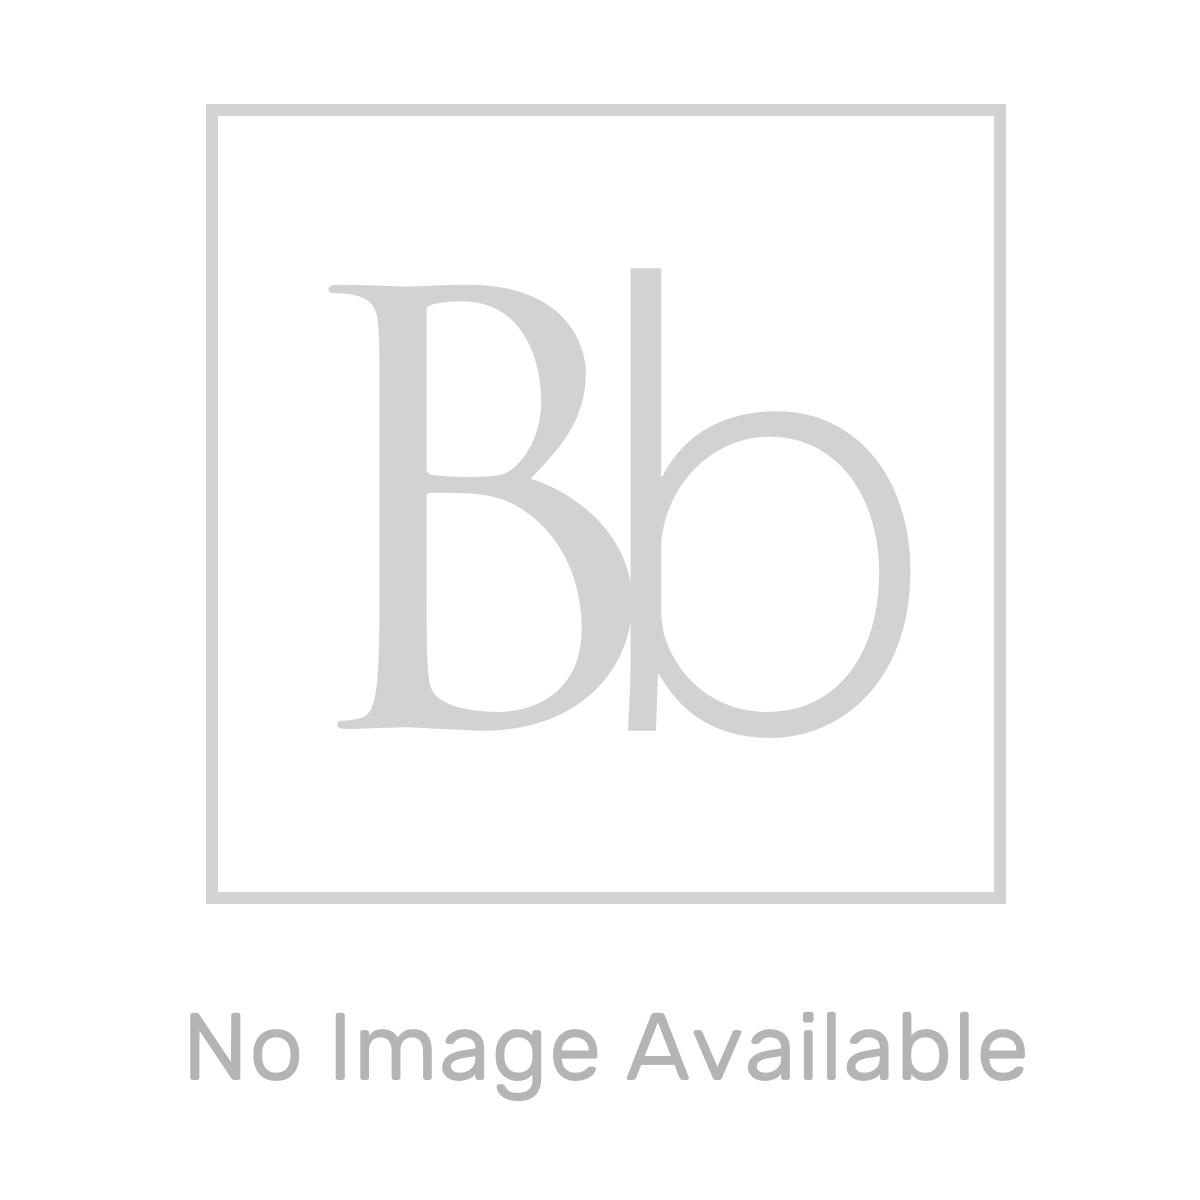 Cassellie Quadrato Thermostatic Mixer Shower Kit Dimensions